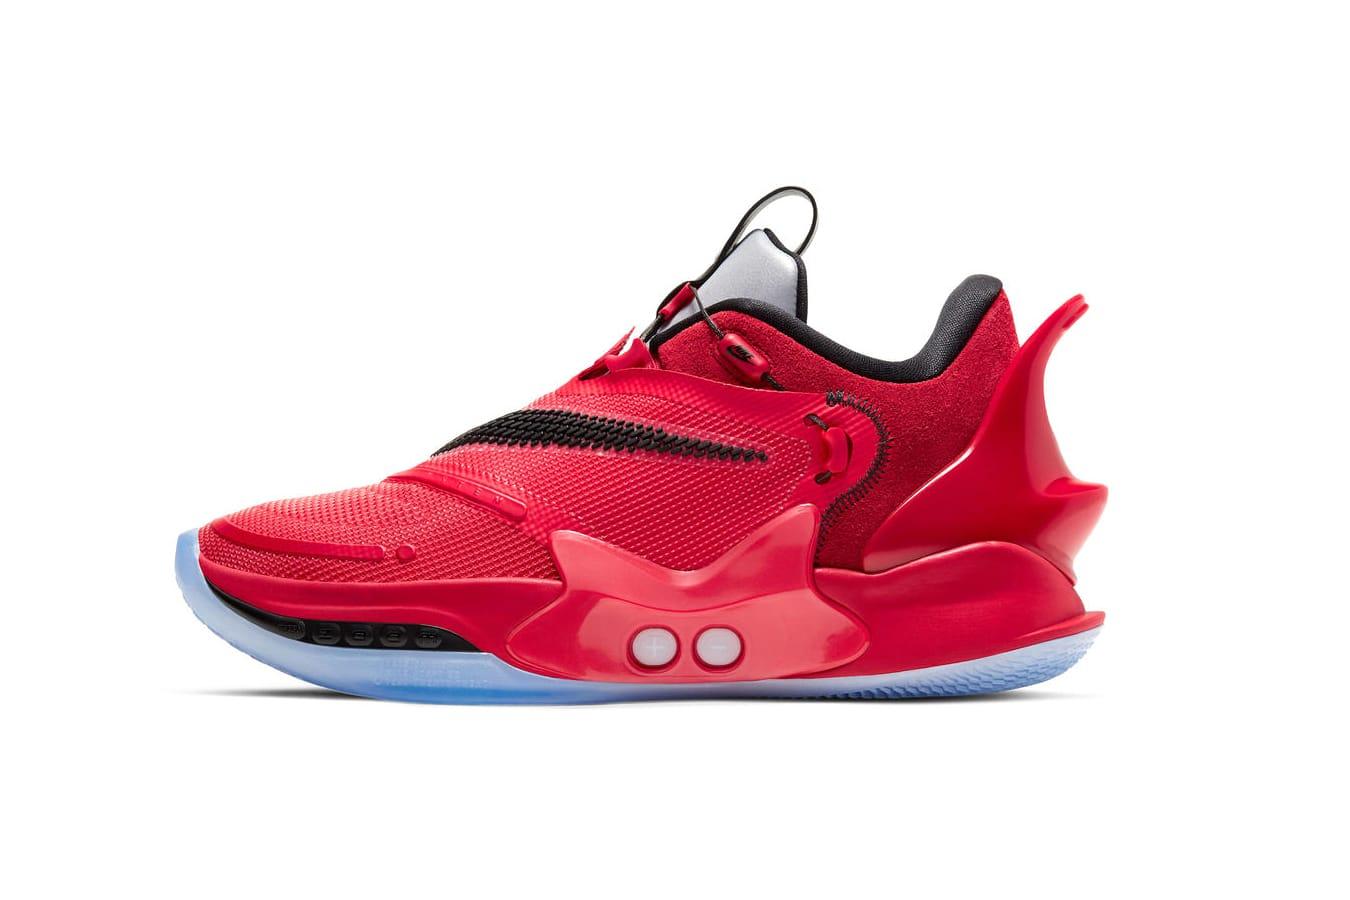 Nike 2K20-Exclusive Adapt BB 2.0